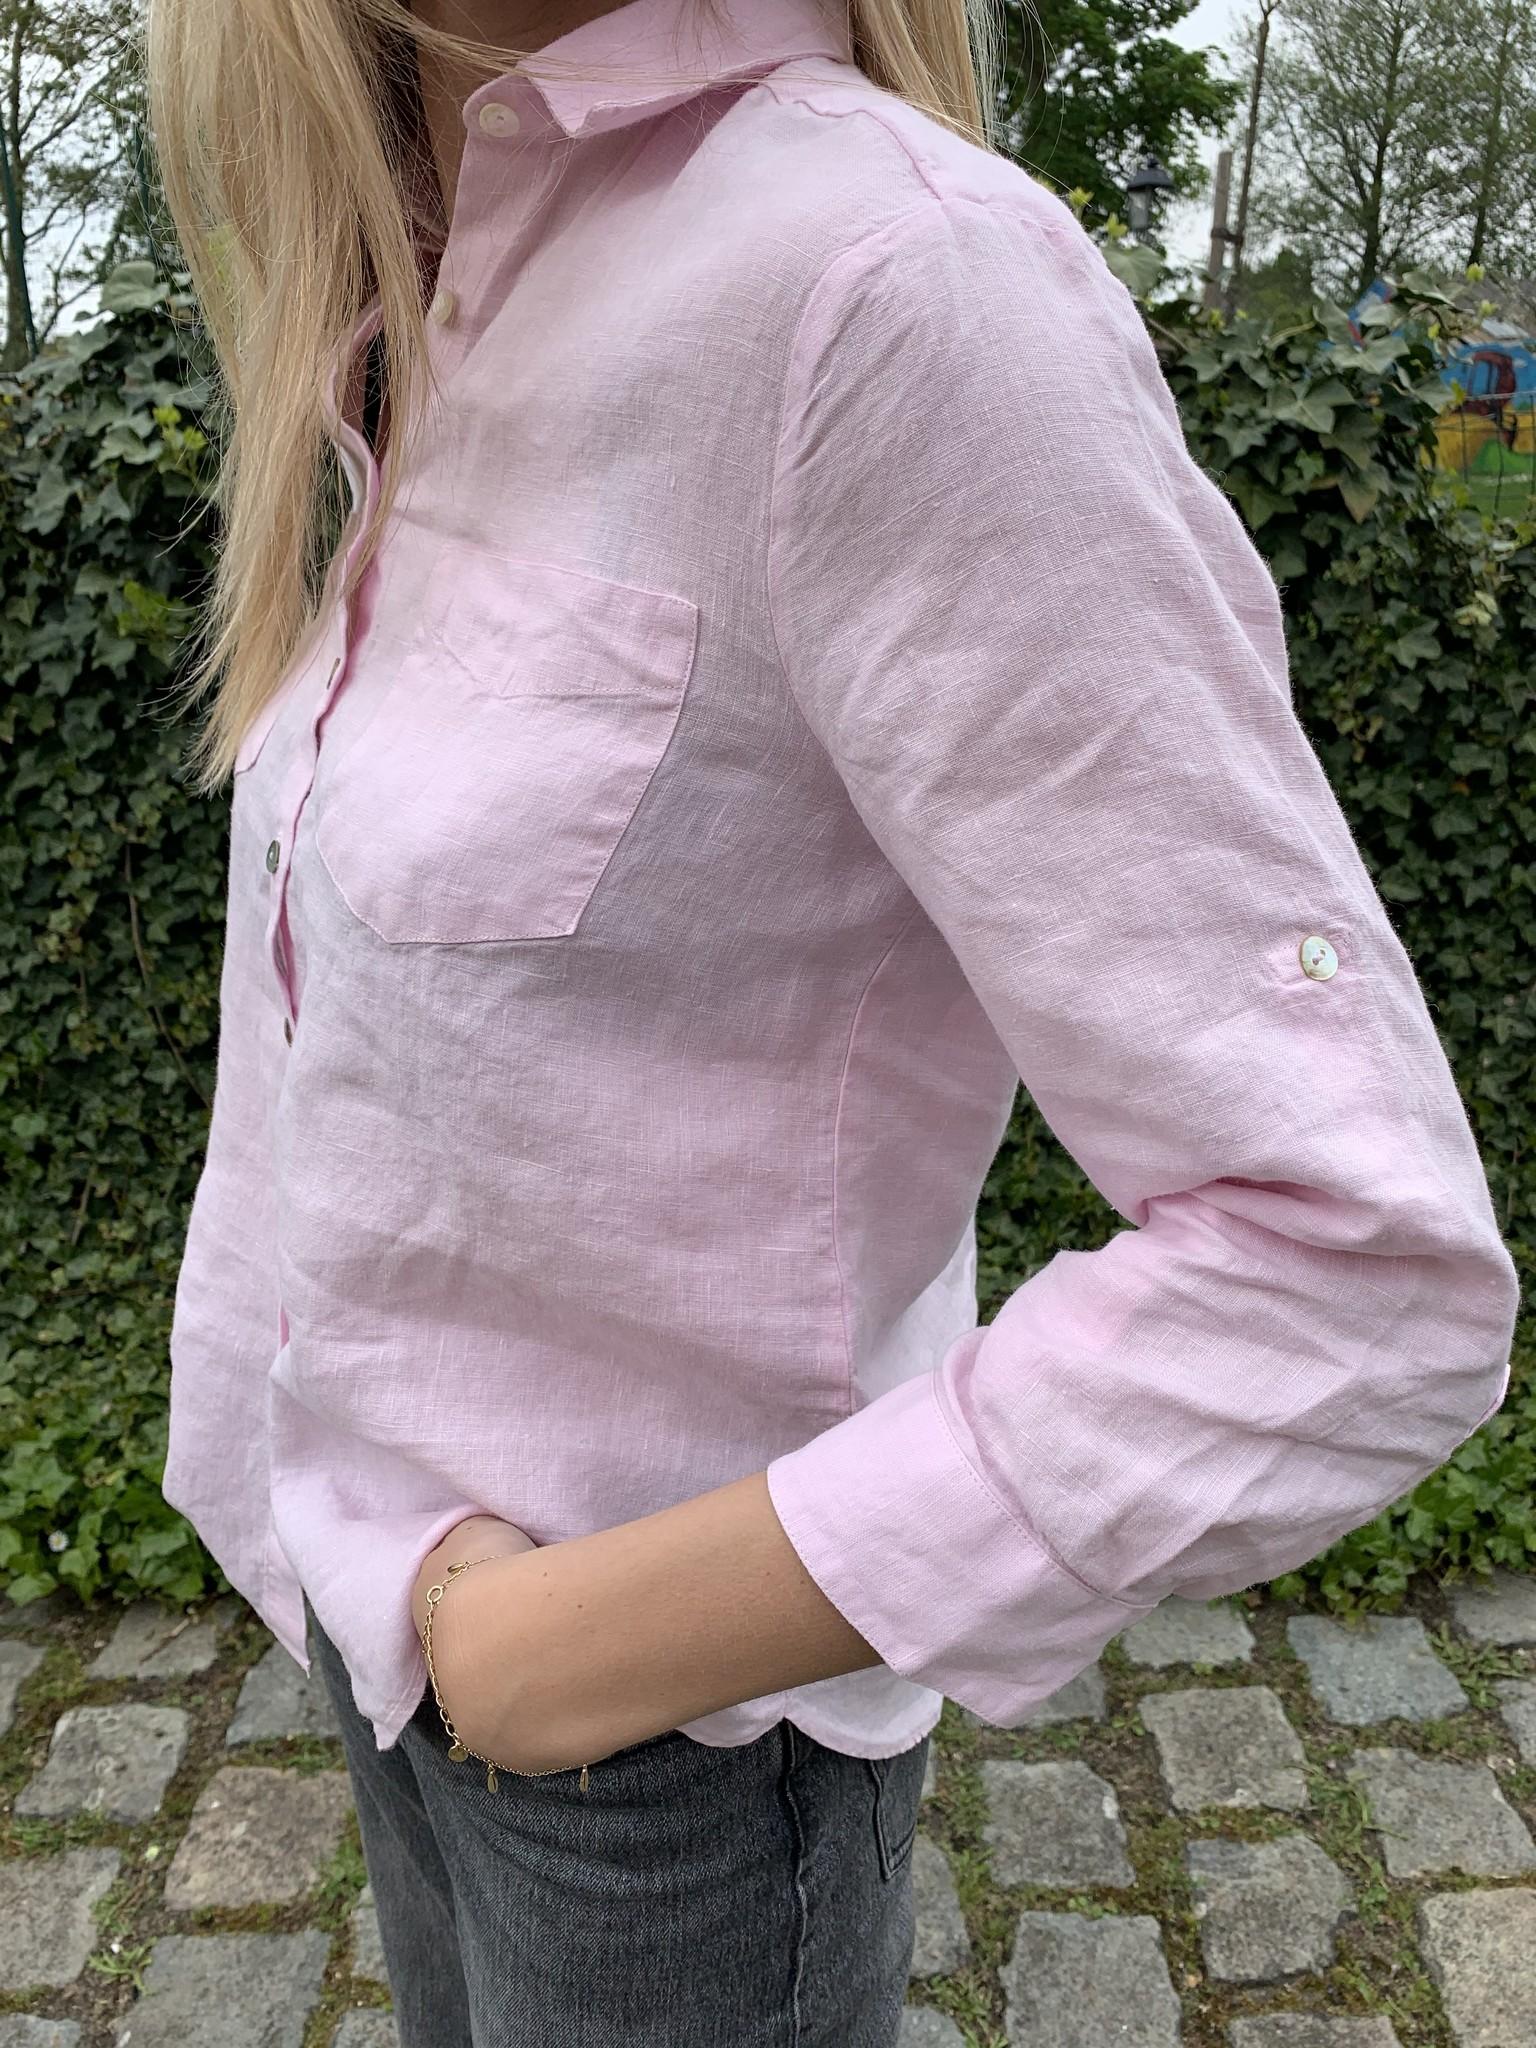 Zuiver linnen blouse, 3/4 mouwen, lichtroze